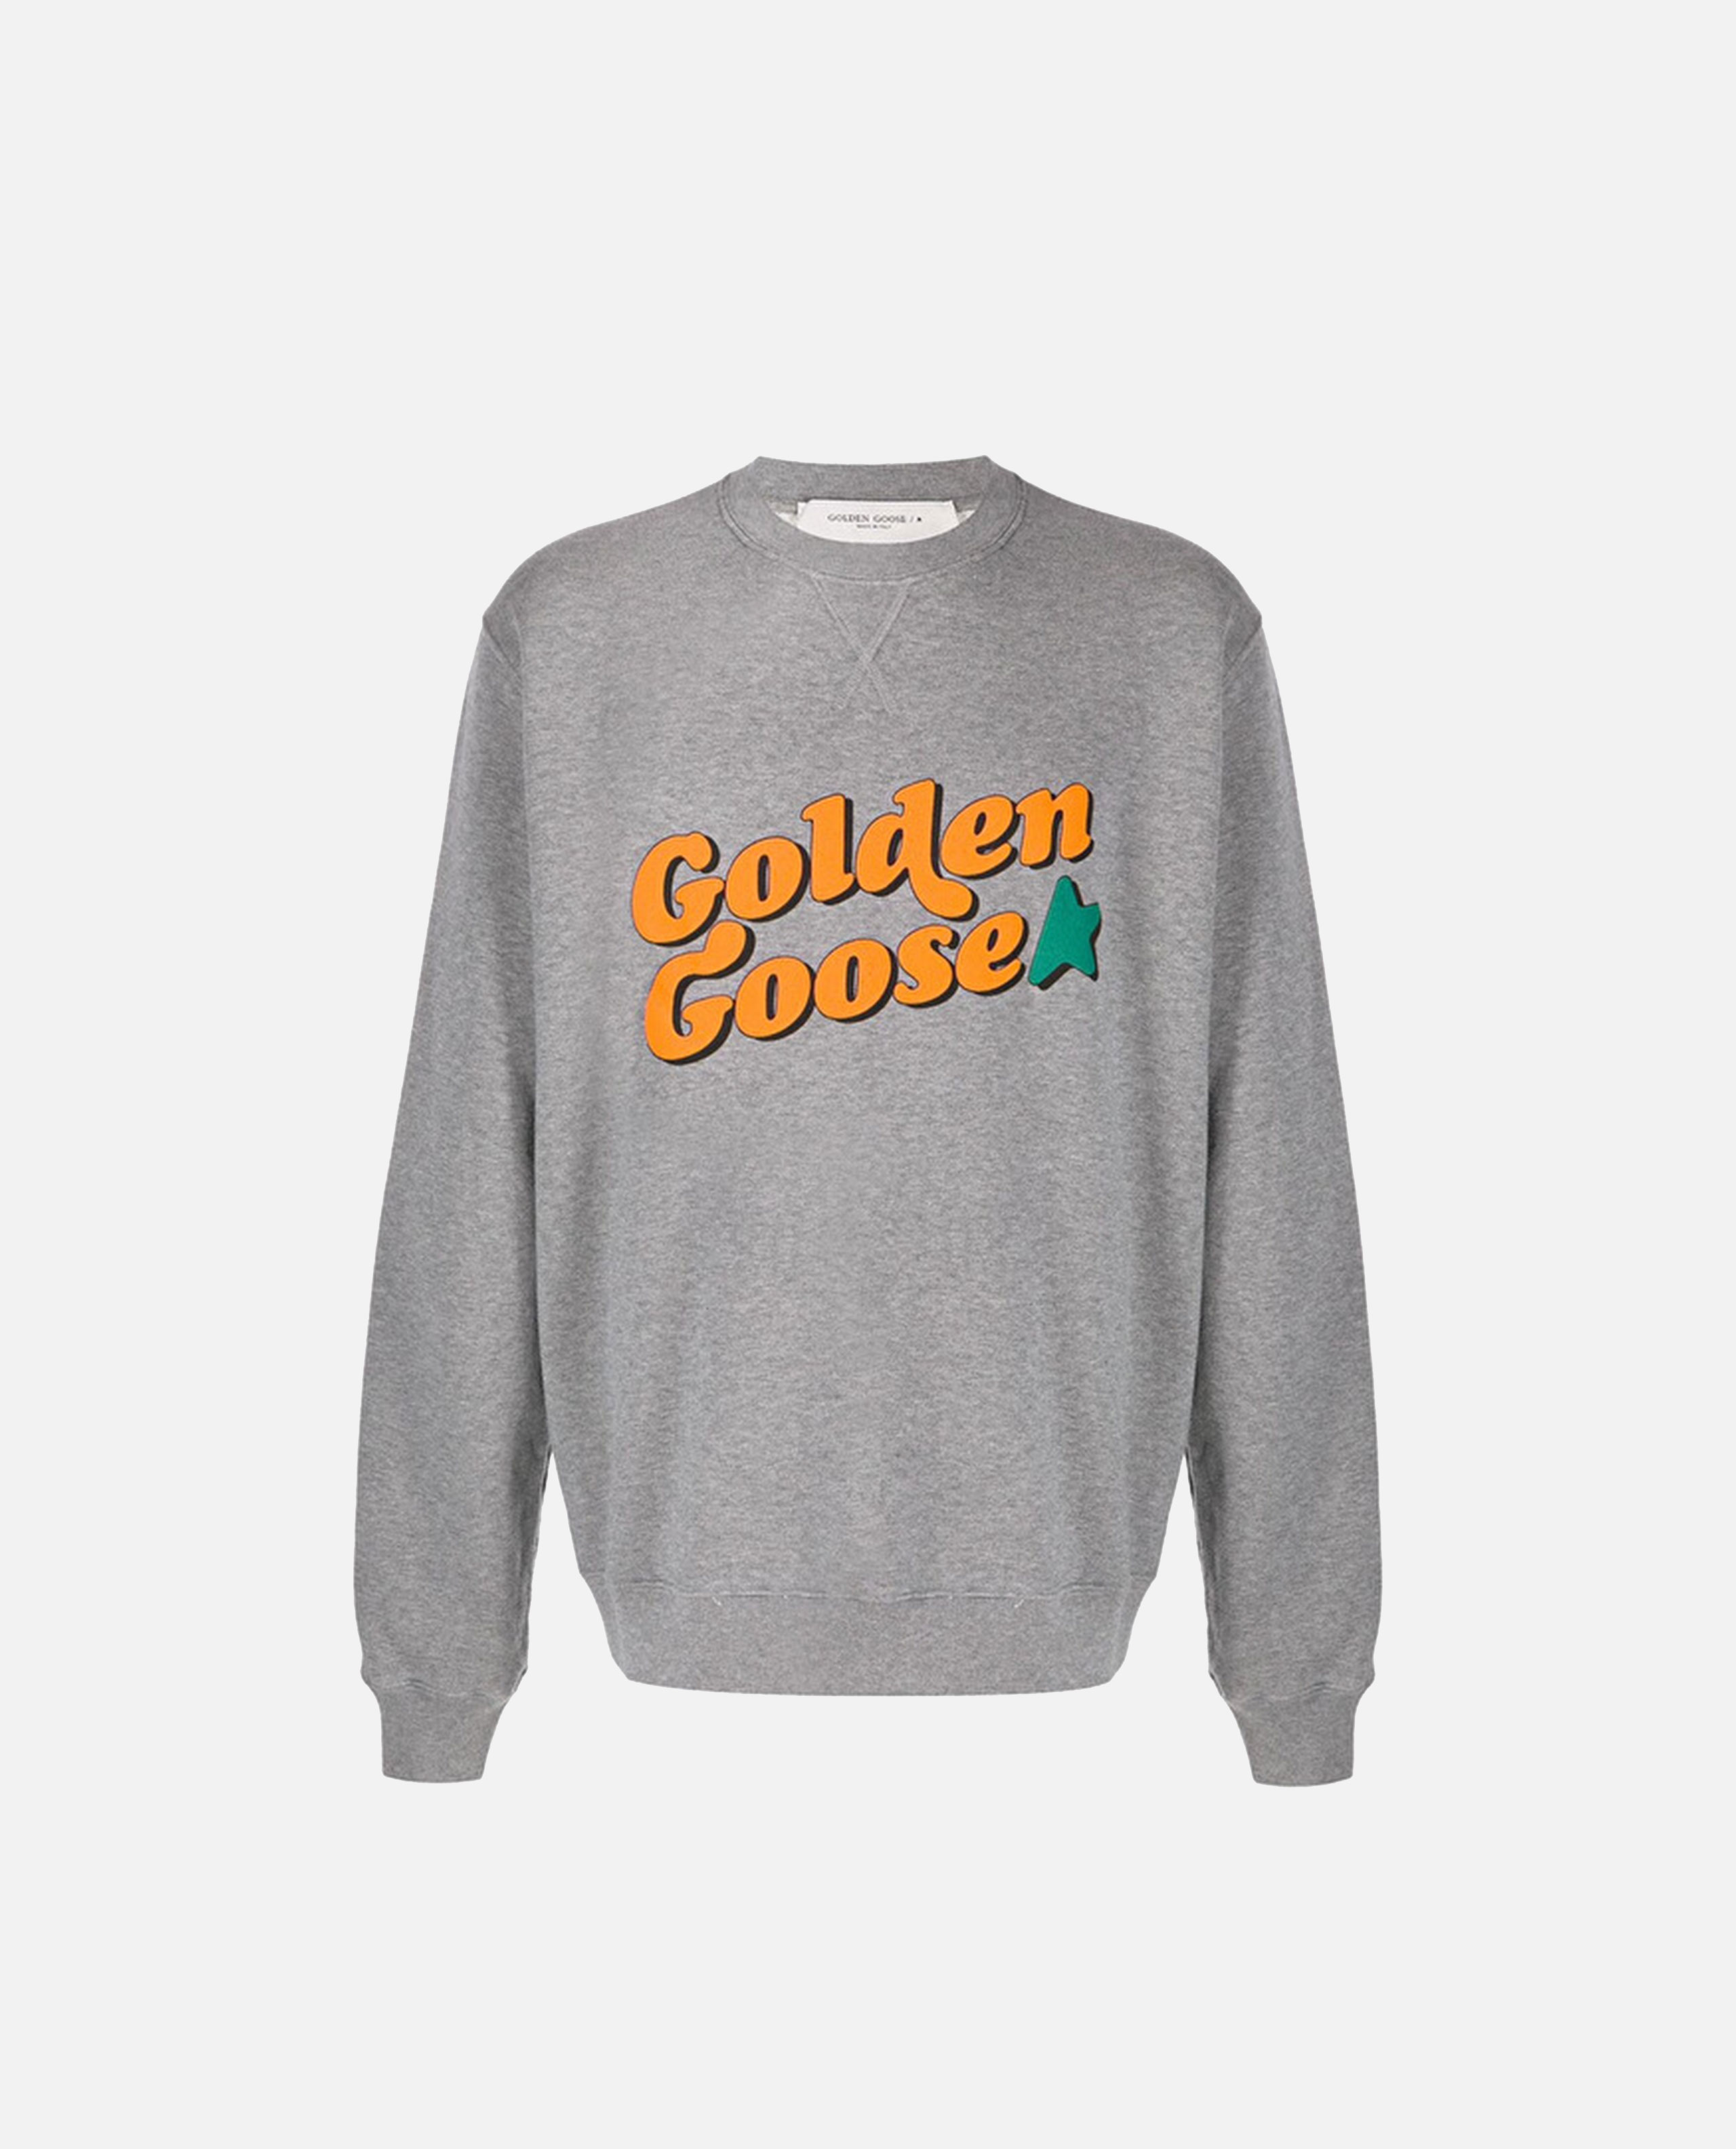 Sweatshirt with Vintage Logo Print